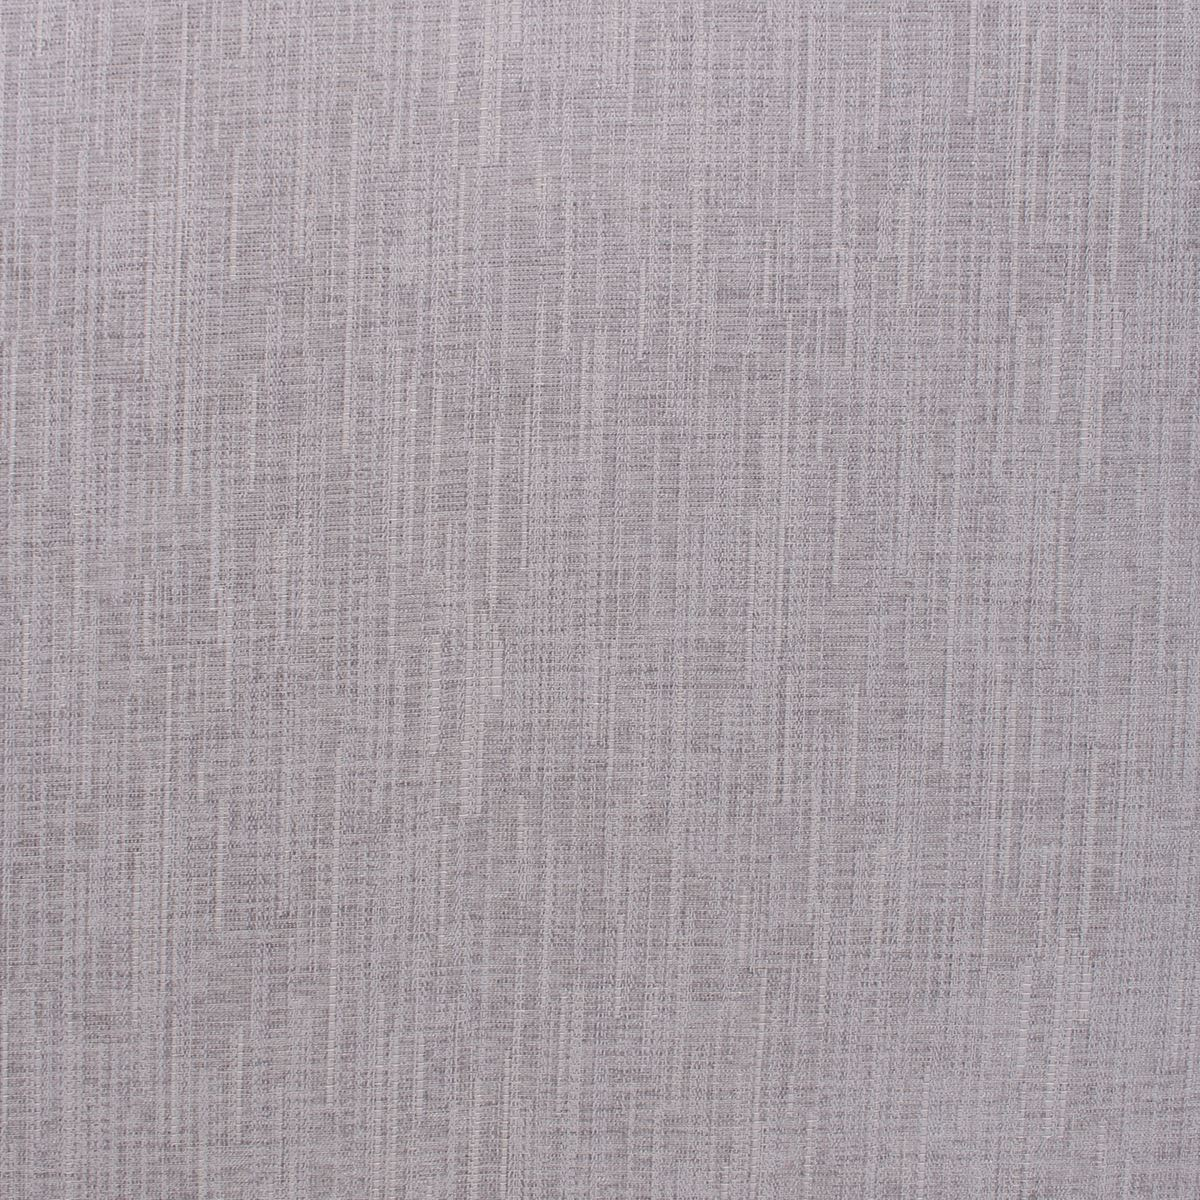 034-Chenille-034-Slubbed-Shabby-Worn-Look-Curtain-Cushion-Sofa-Upholstery-Fabric thumbnail 55